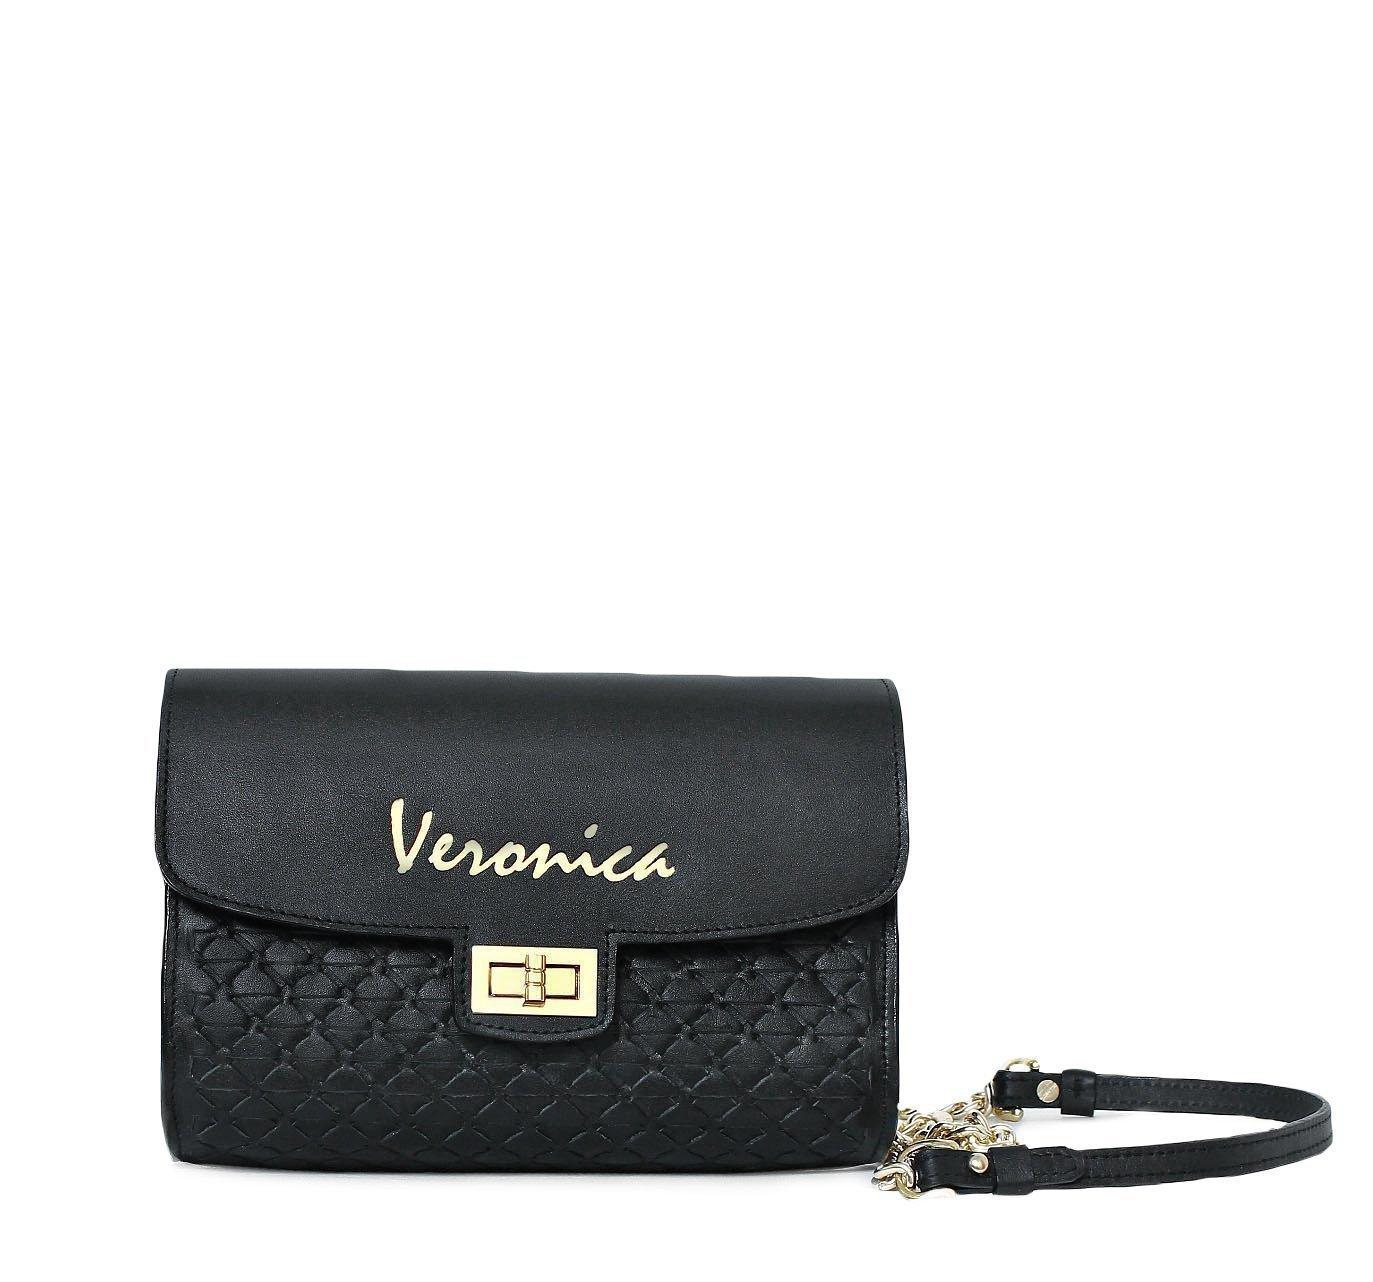 ALAYLA personalized woven black leather clutch handbag - Leather shoulder bag with gold hardware - Alel